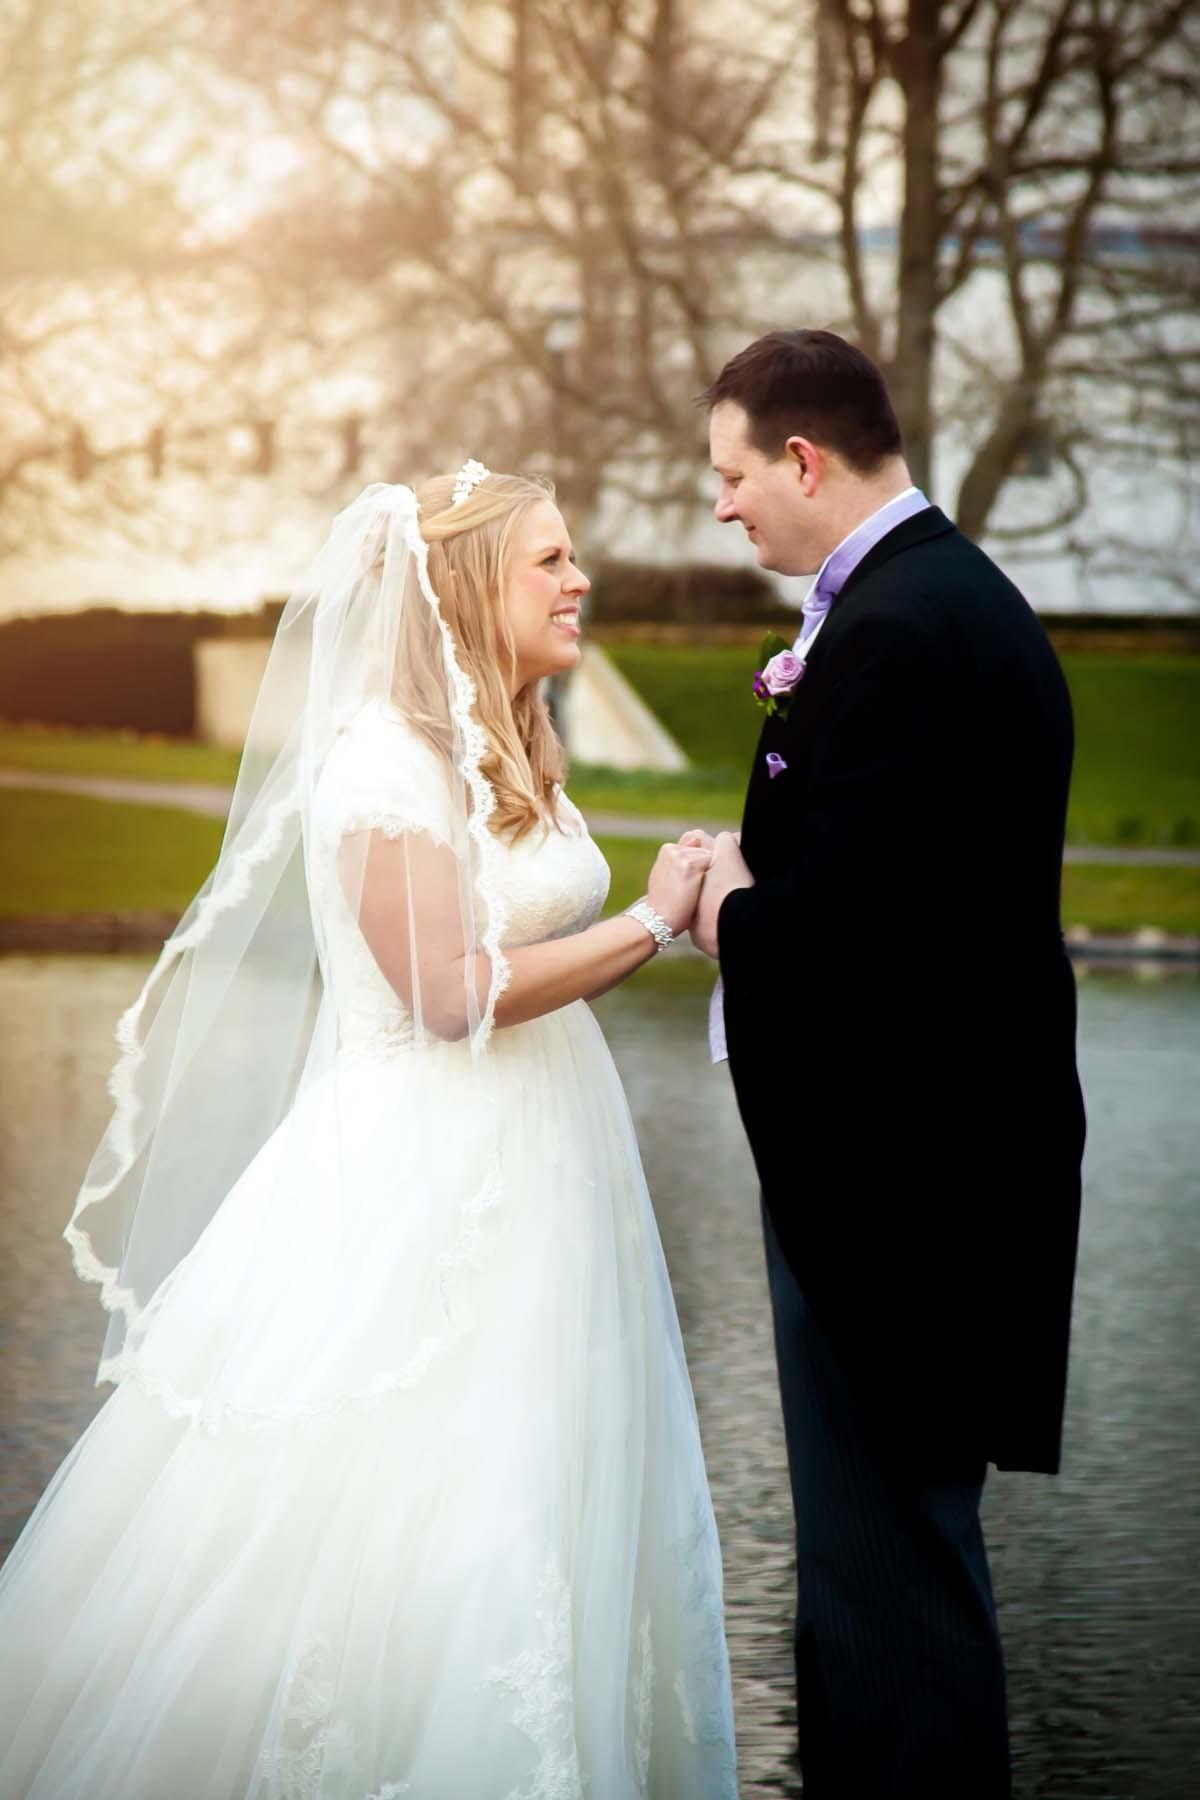 Sussex & Surrey Wedding Photographer - Bride & Groom (31)